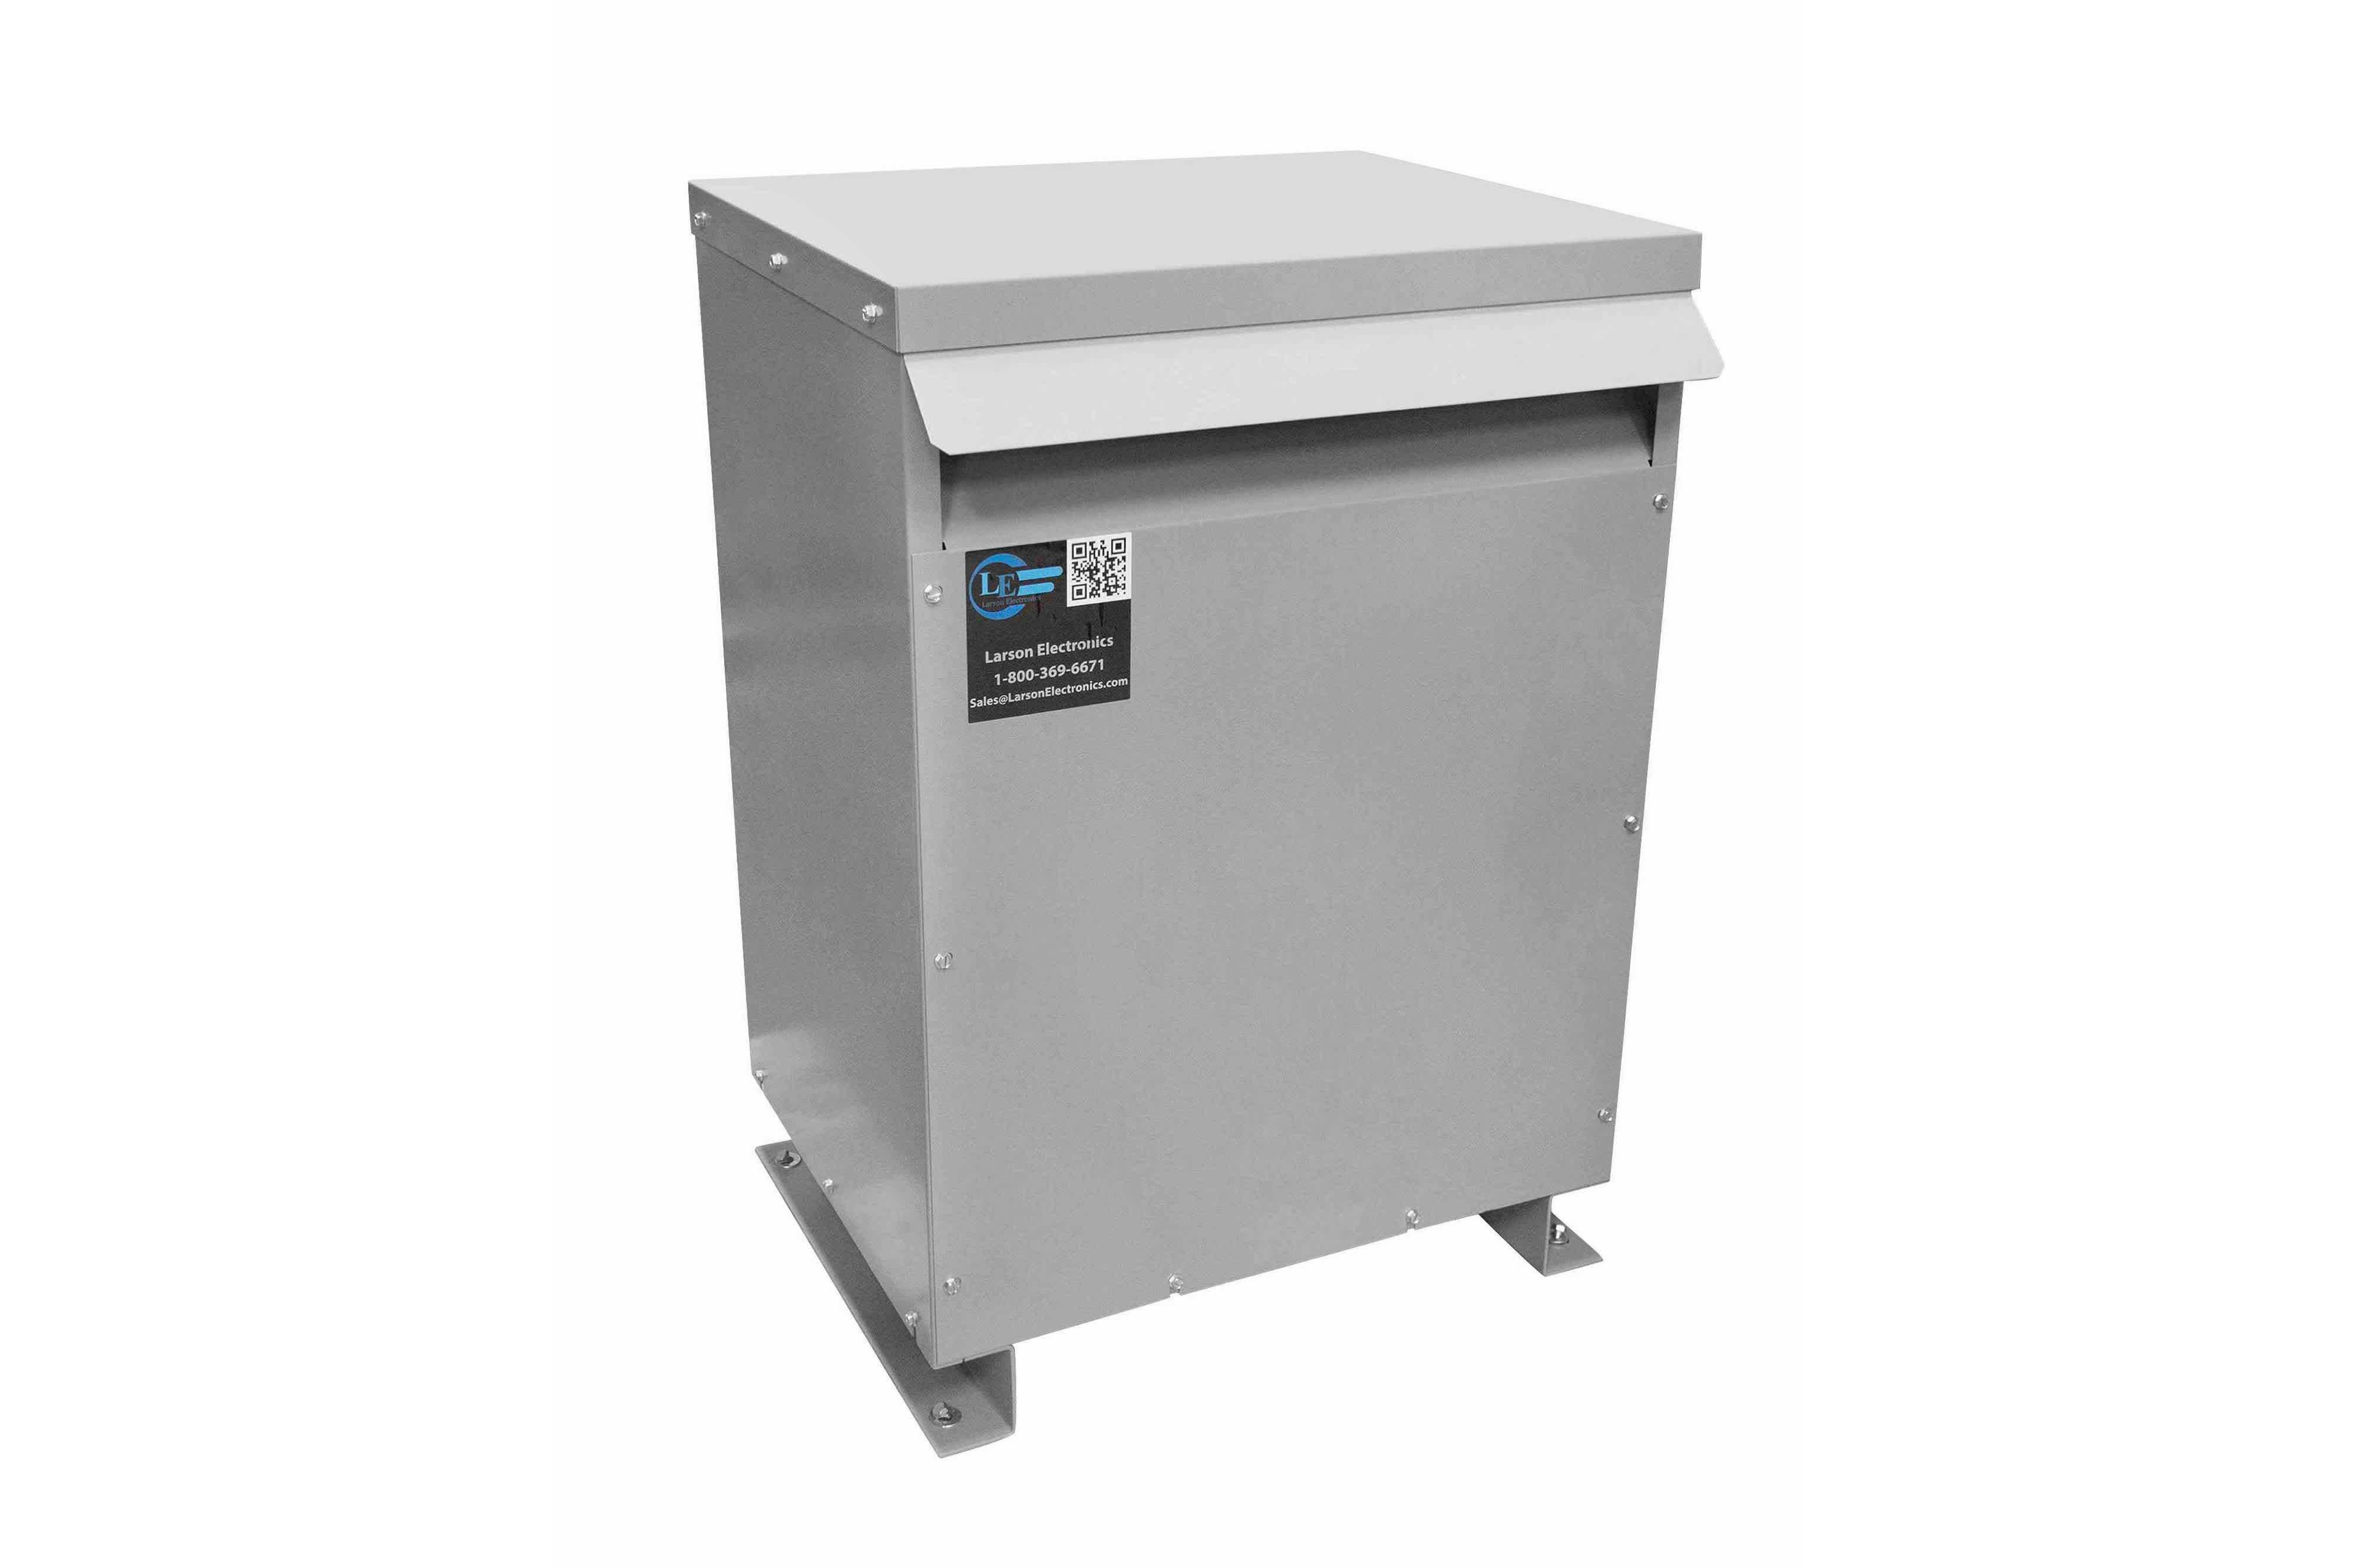 60 kVA 3PH Isolation Transformer, 415V Wye Primary, 480V Delta Secondary, N3R, Ventilated, 60 Hz